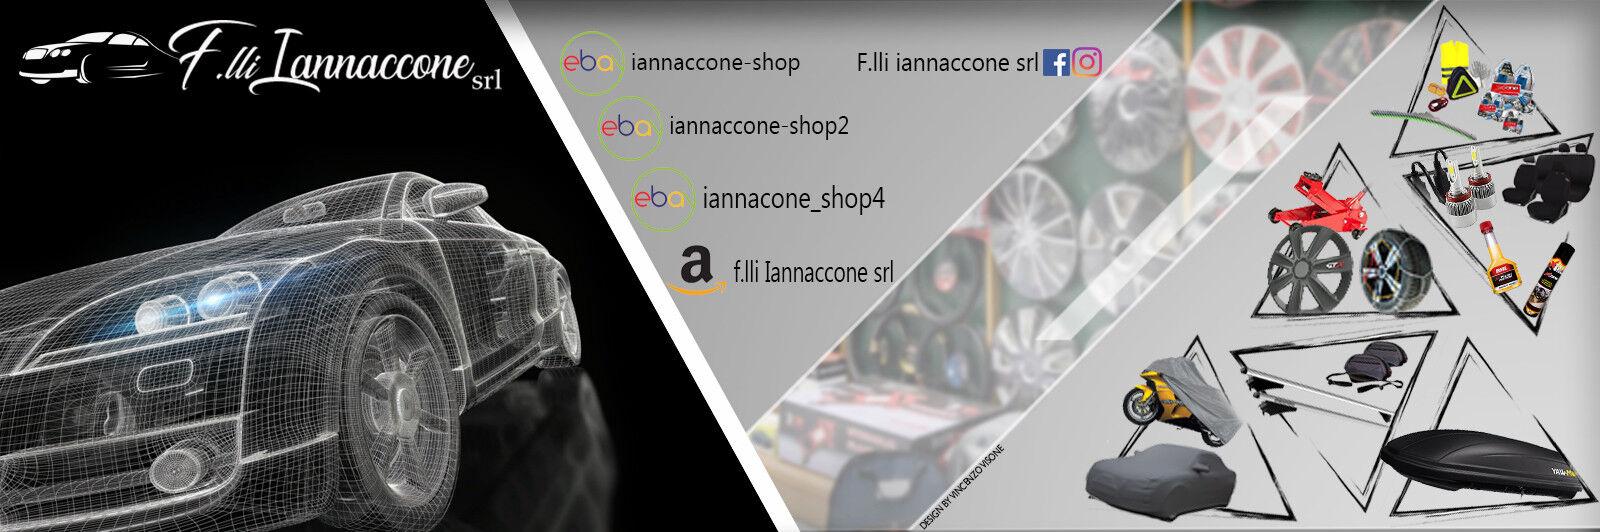 iannaccone-shop2